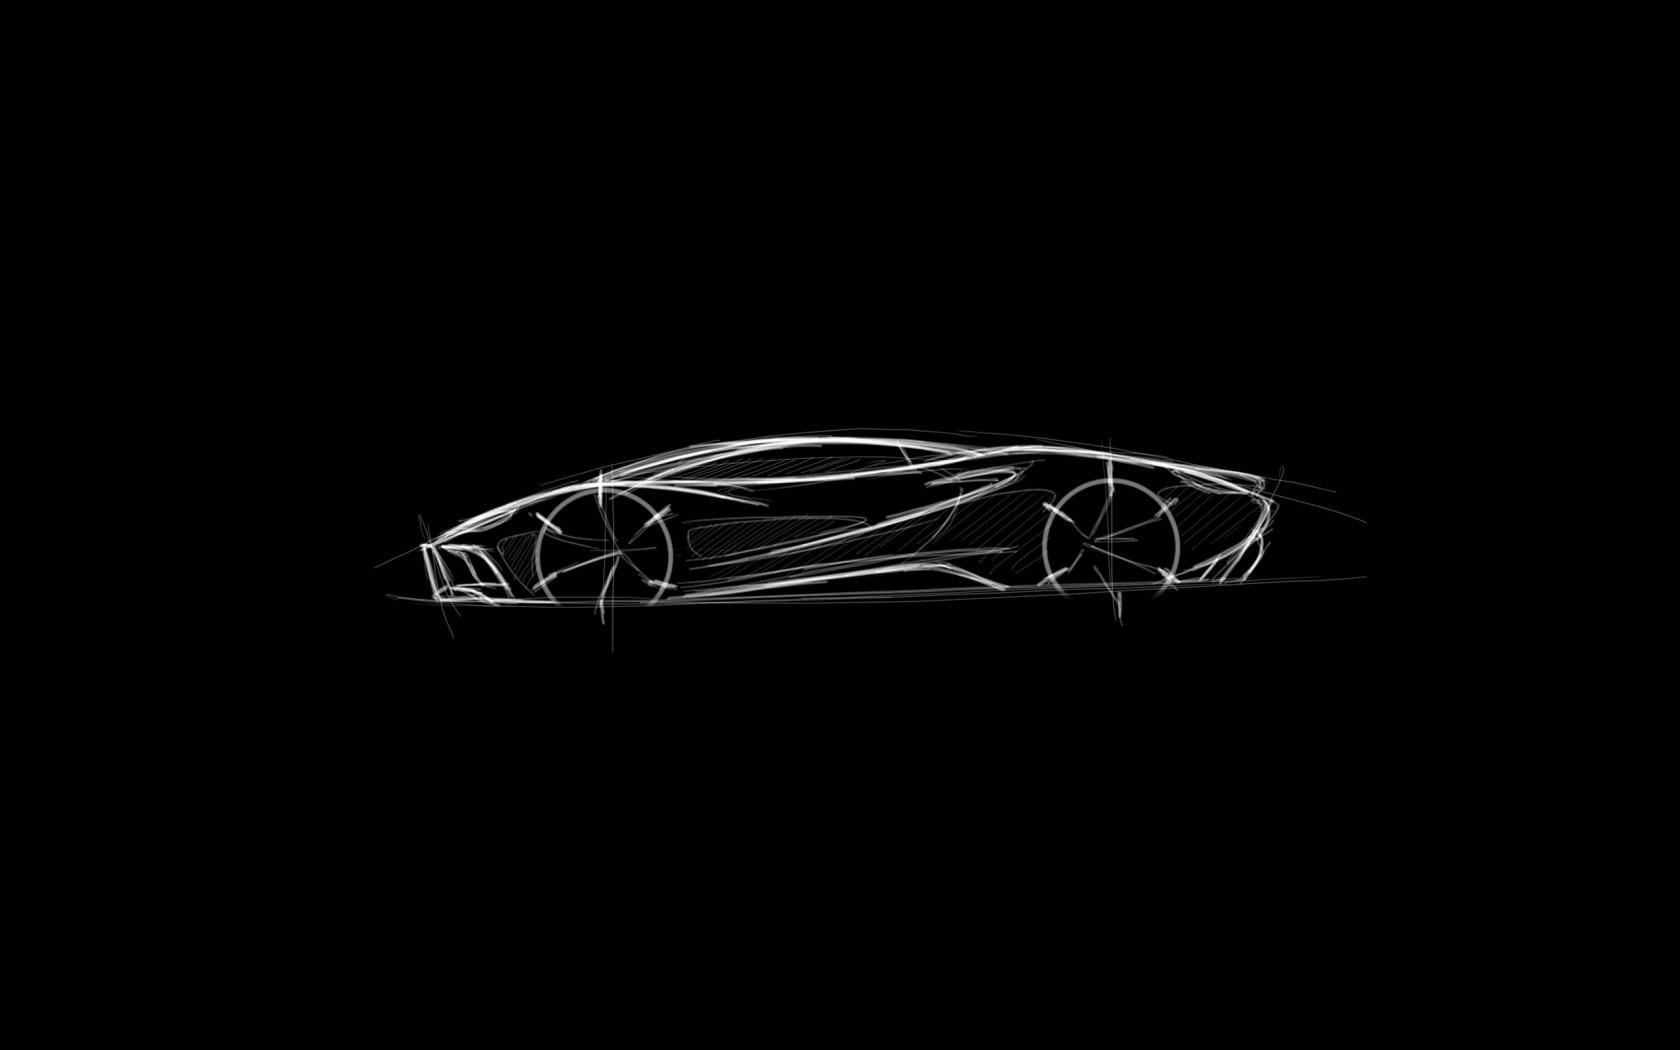 sketches, sports car, modern, monochrome, black background, drawing ...